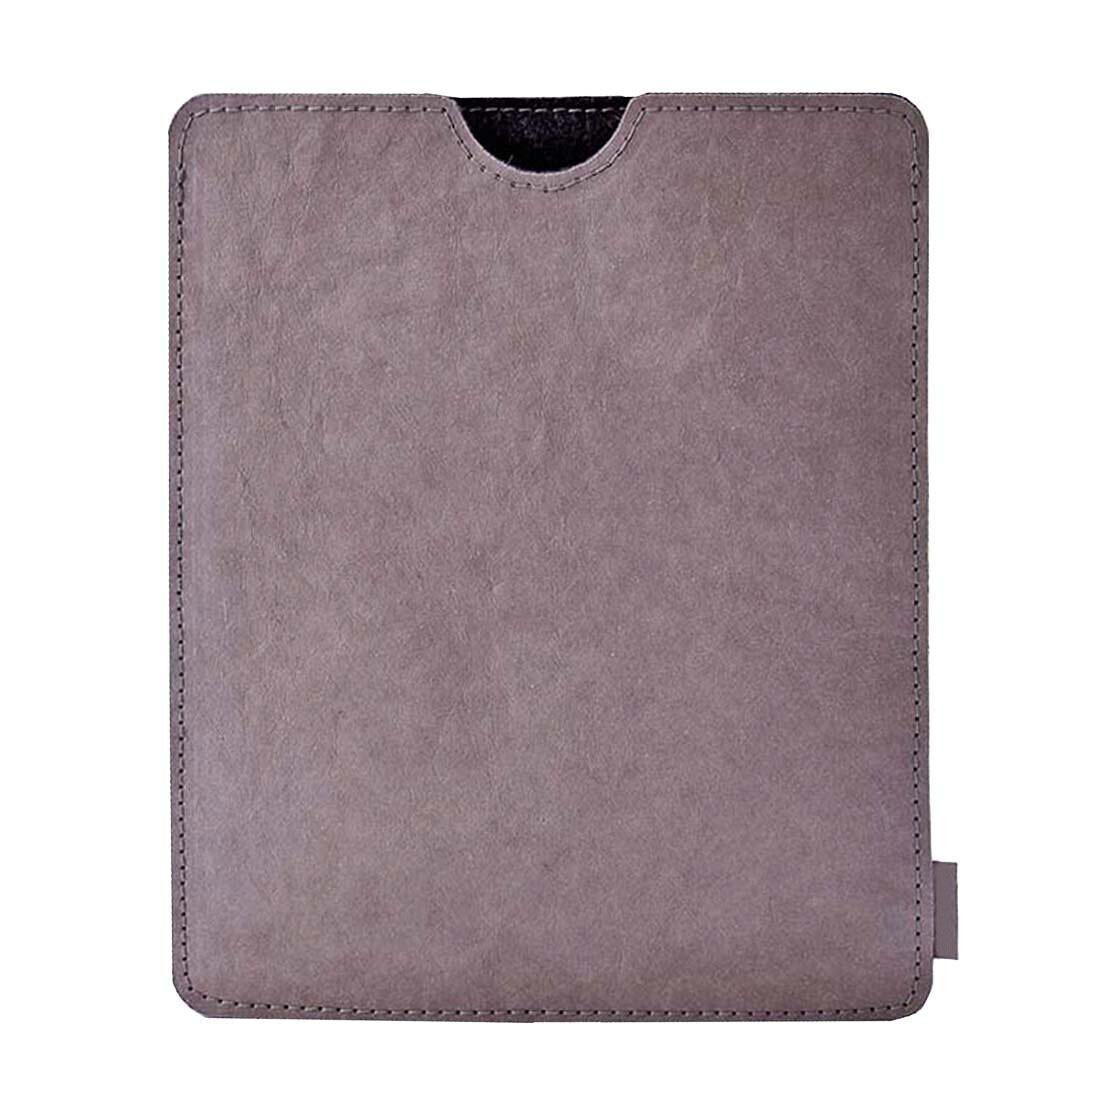 Tablet-Tasche Bret